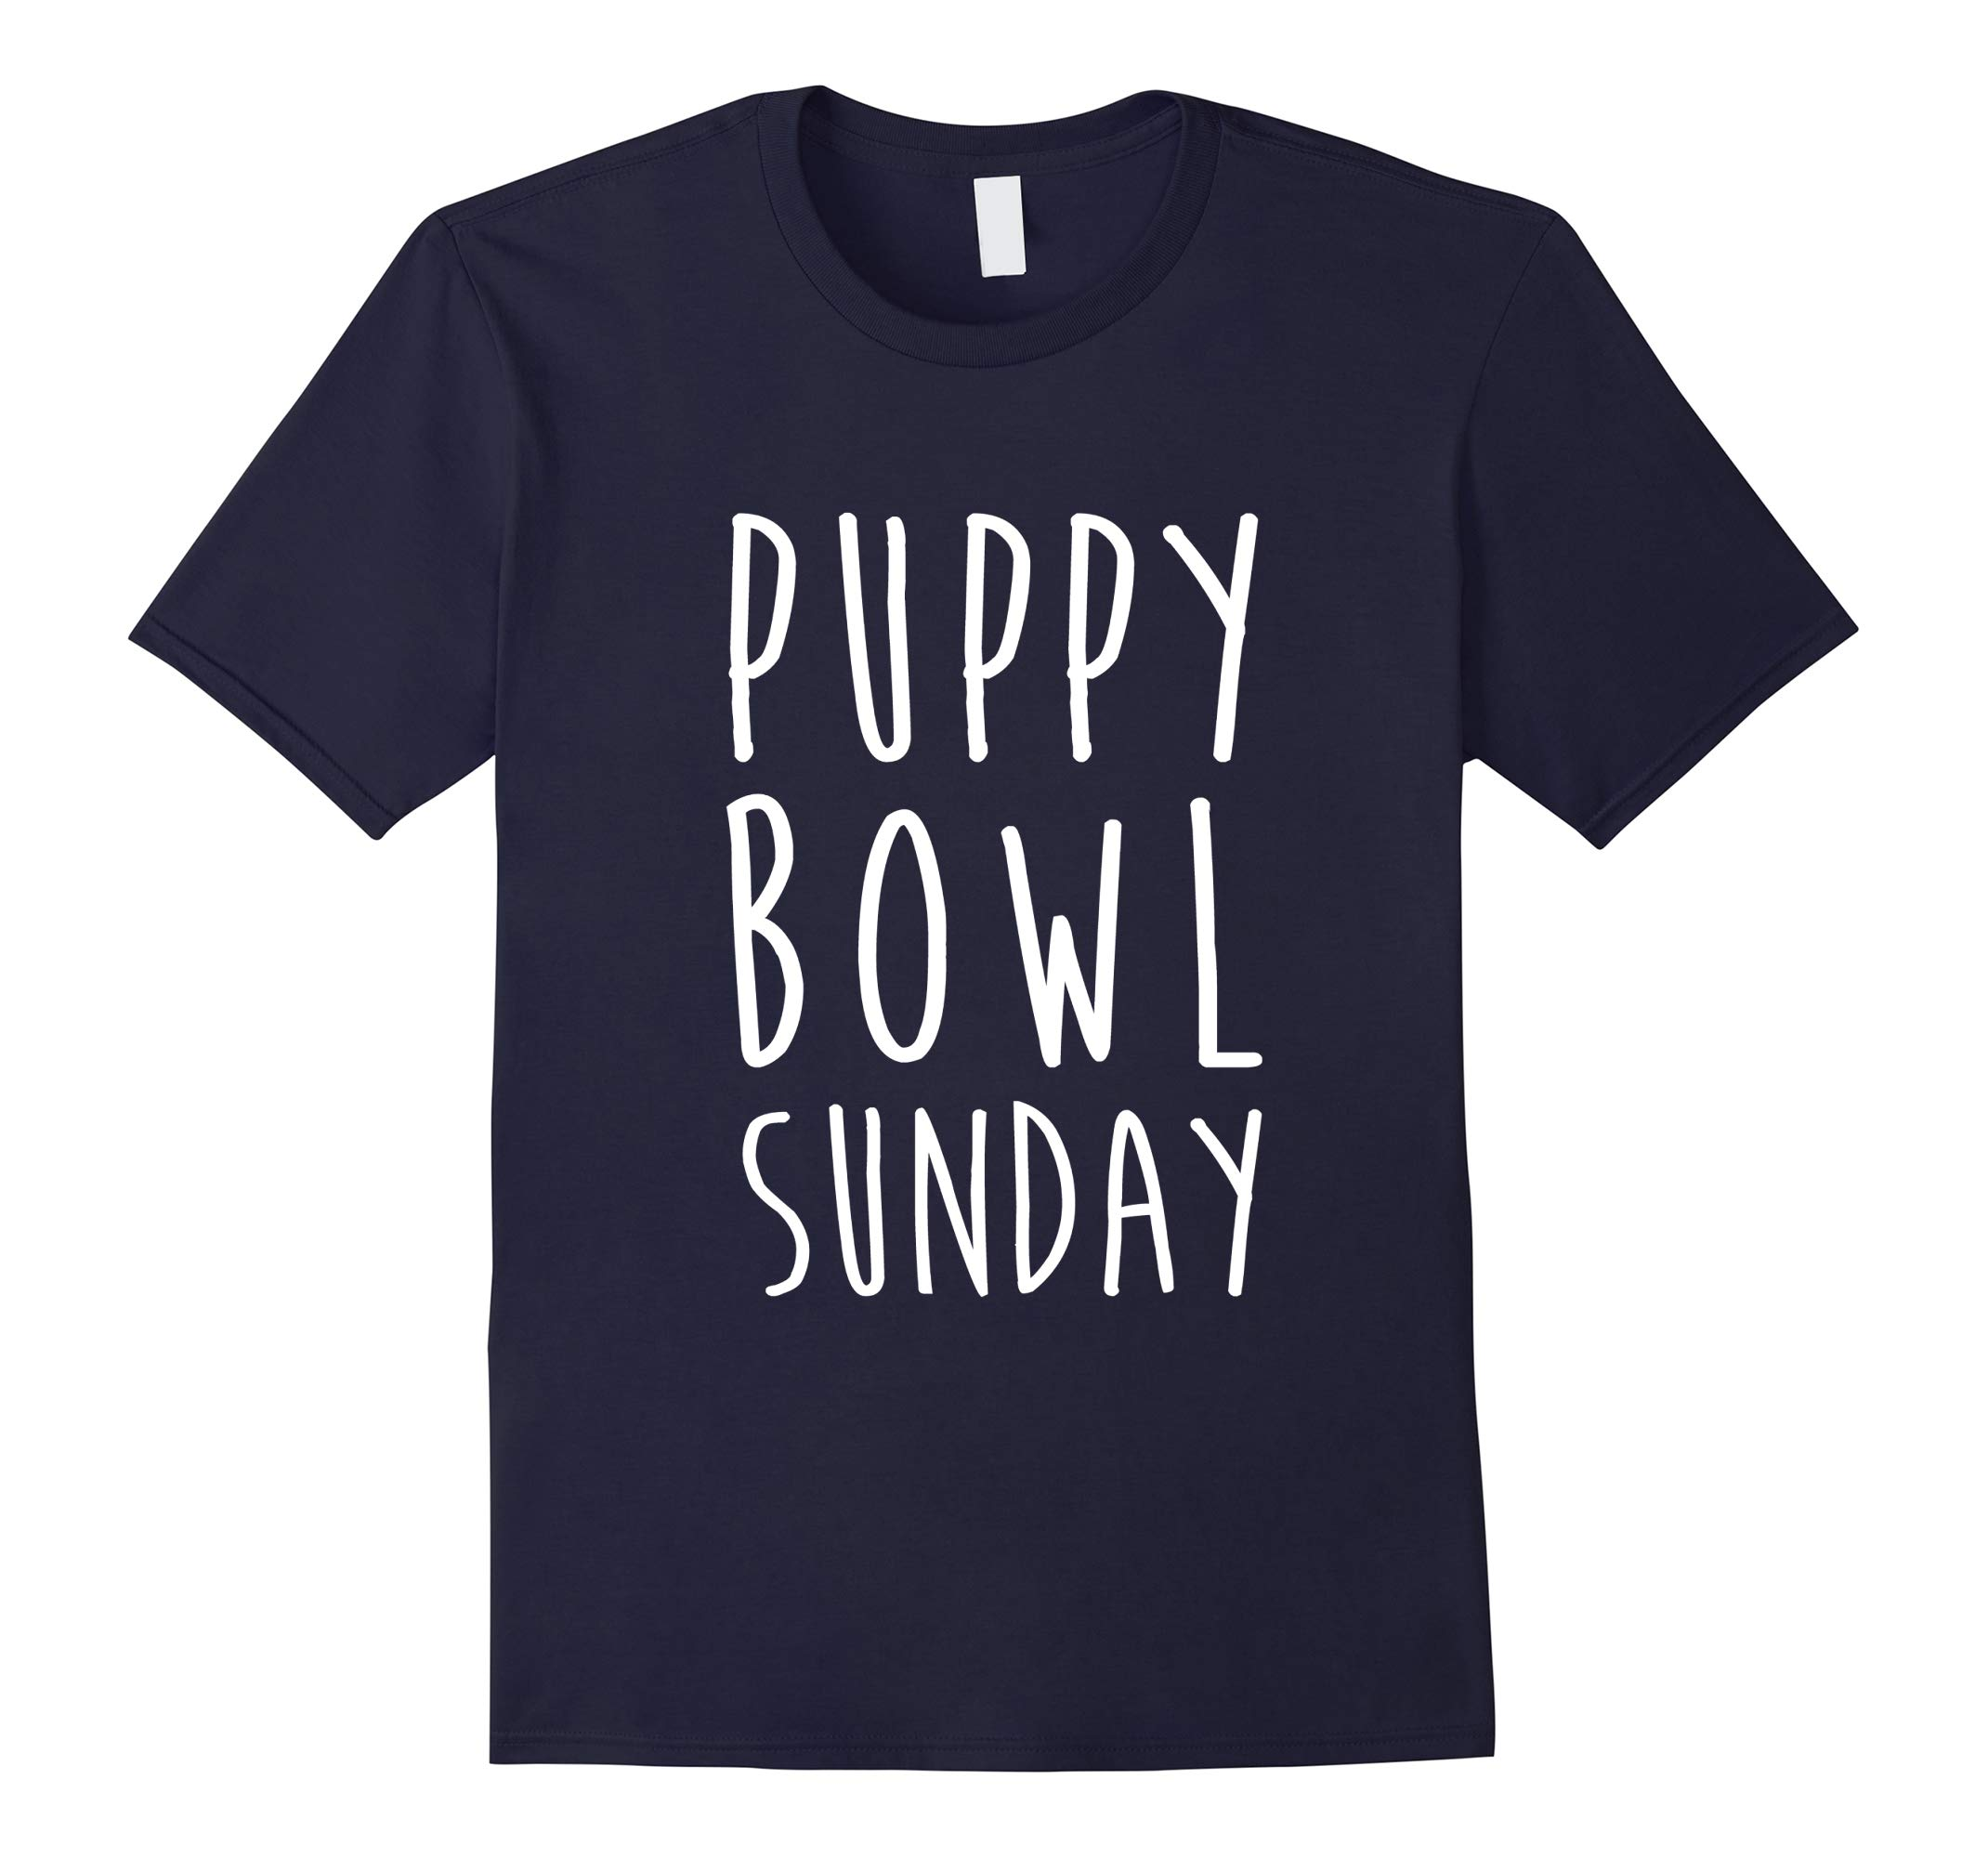 Puppy Bowl Sunday, Funny Football Shirt-RT